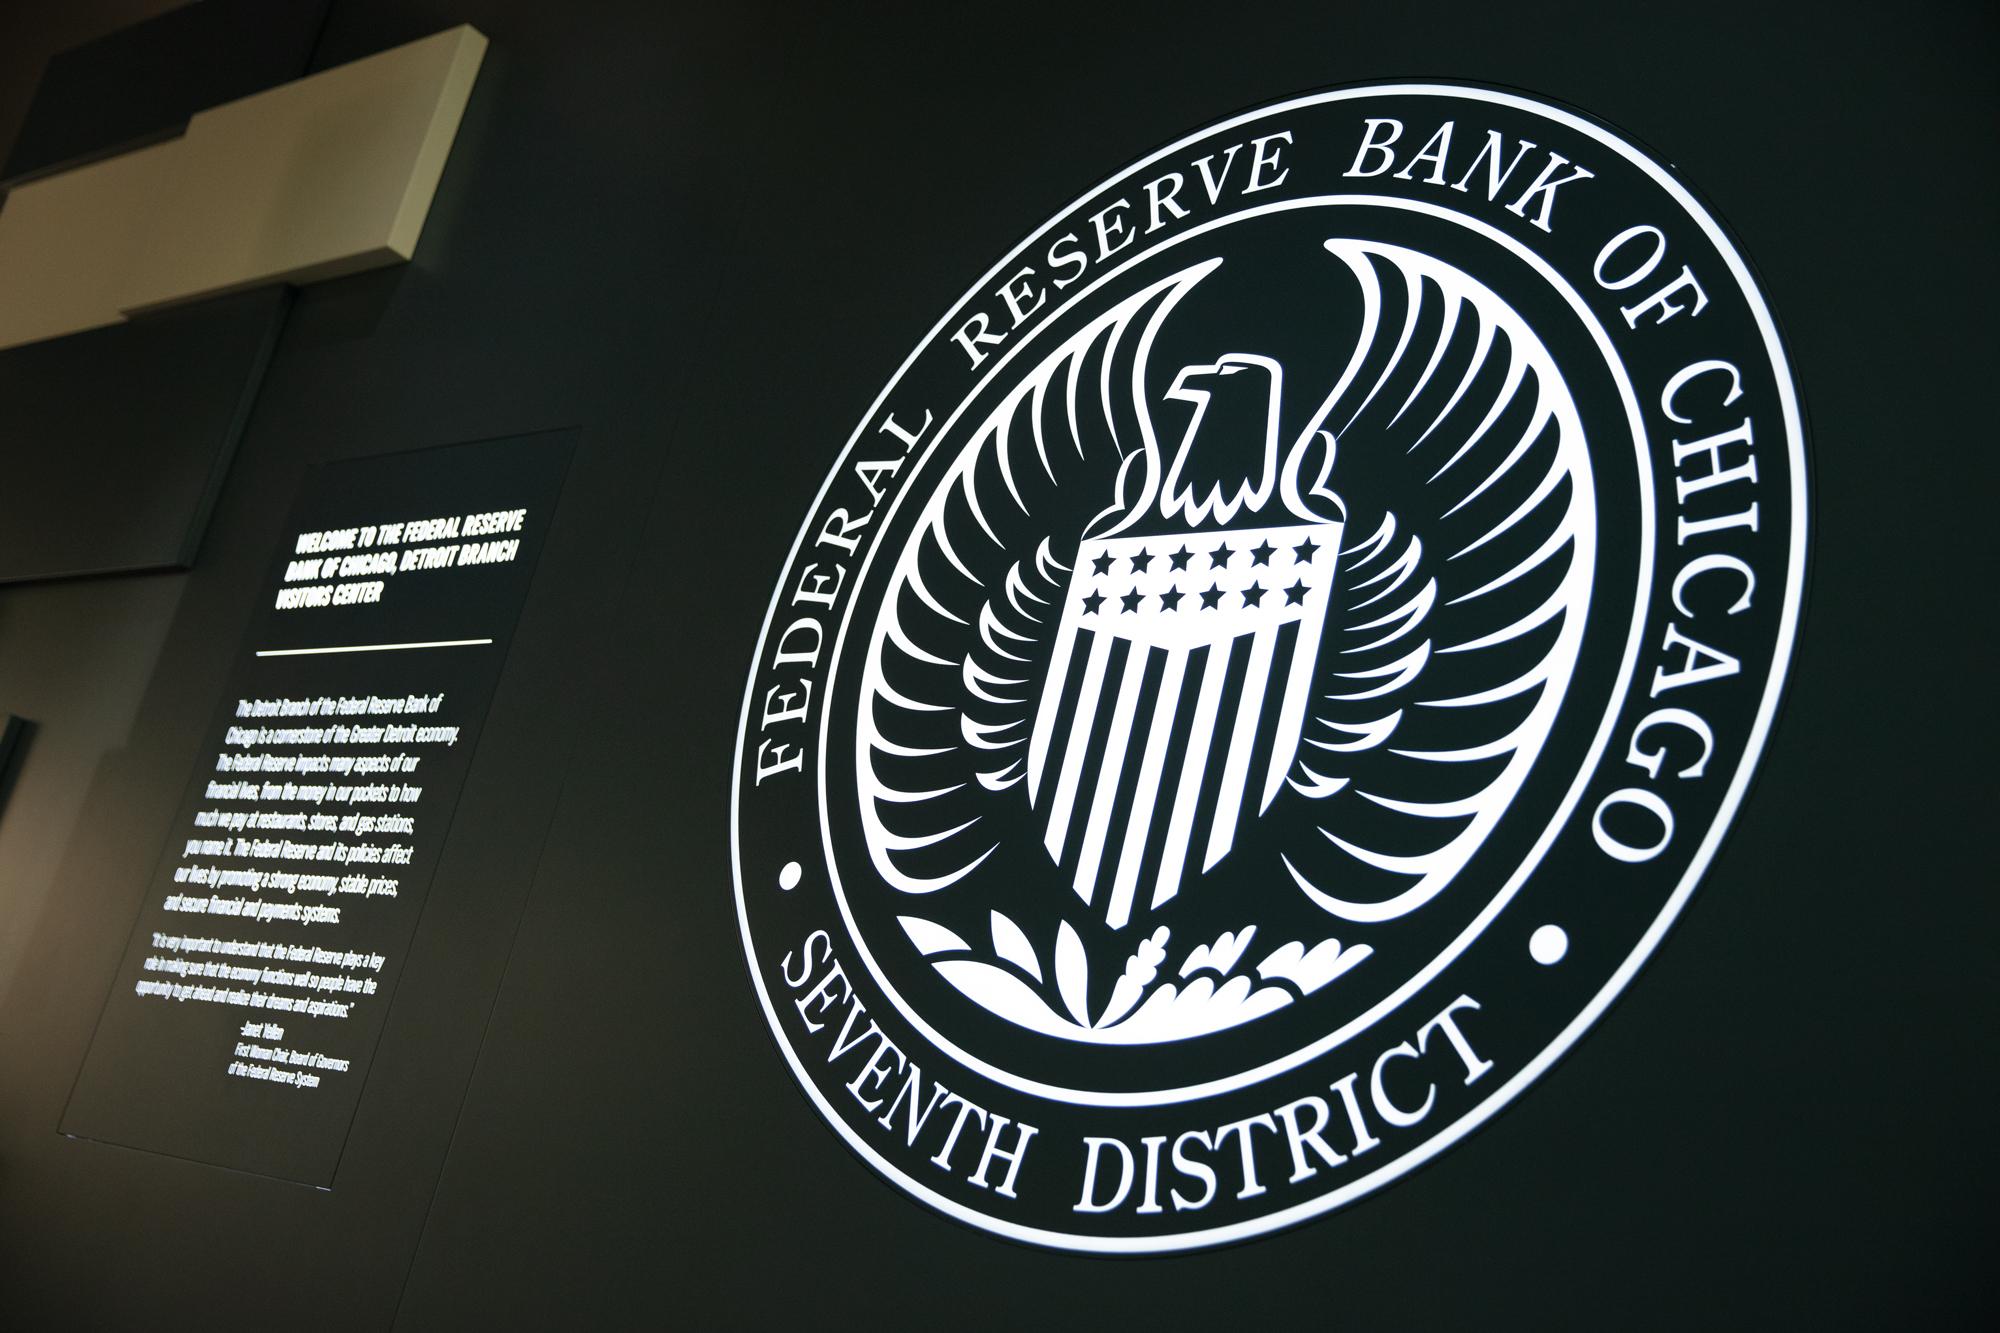 Design element on the Detroit Branch Visitors Center's exhibit wall